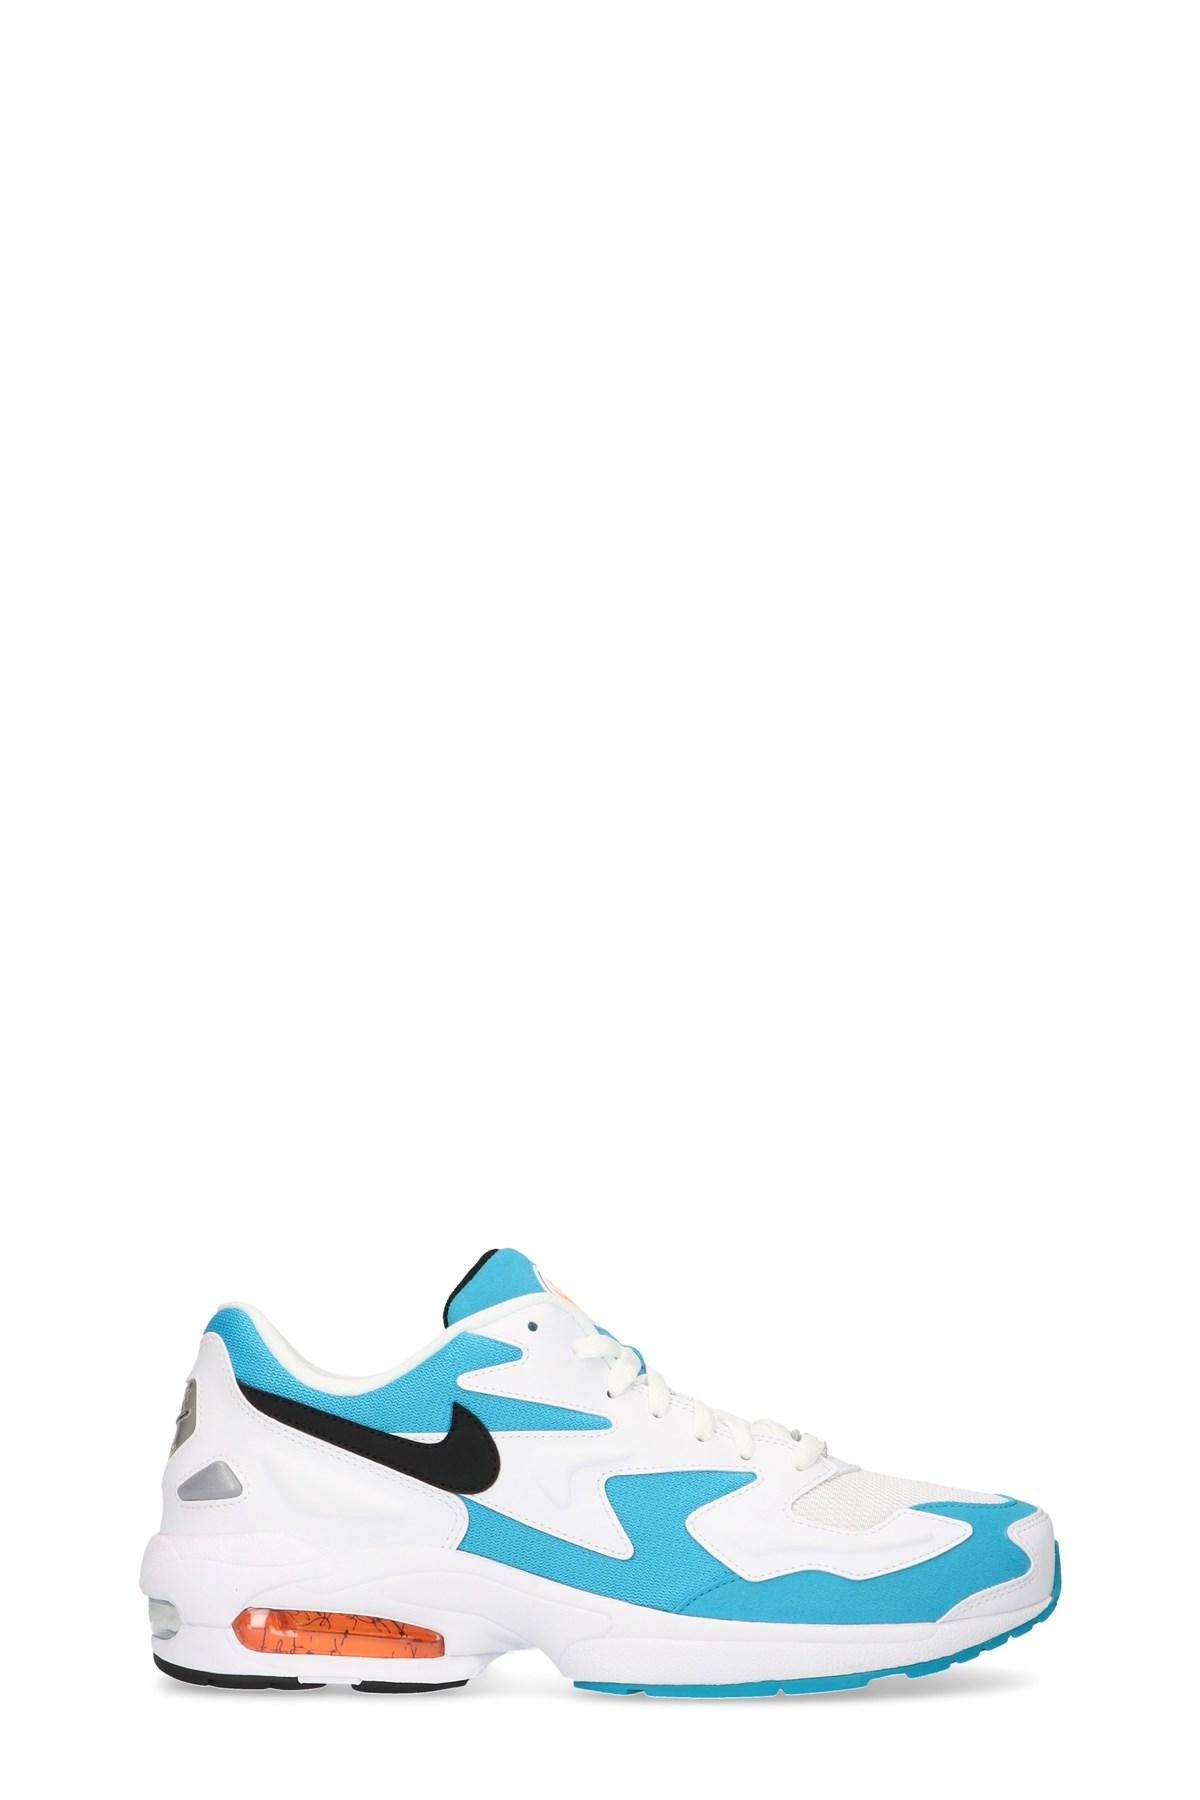 new product c13d2 9fb64 NIKE Air max 2light sneakers - COD. AO1741100